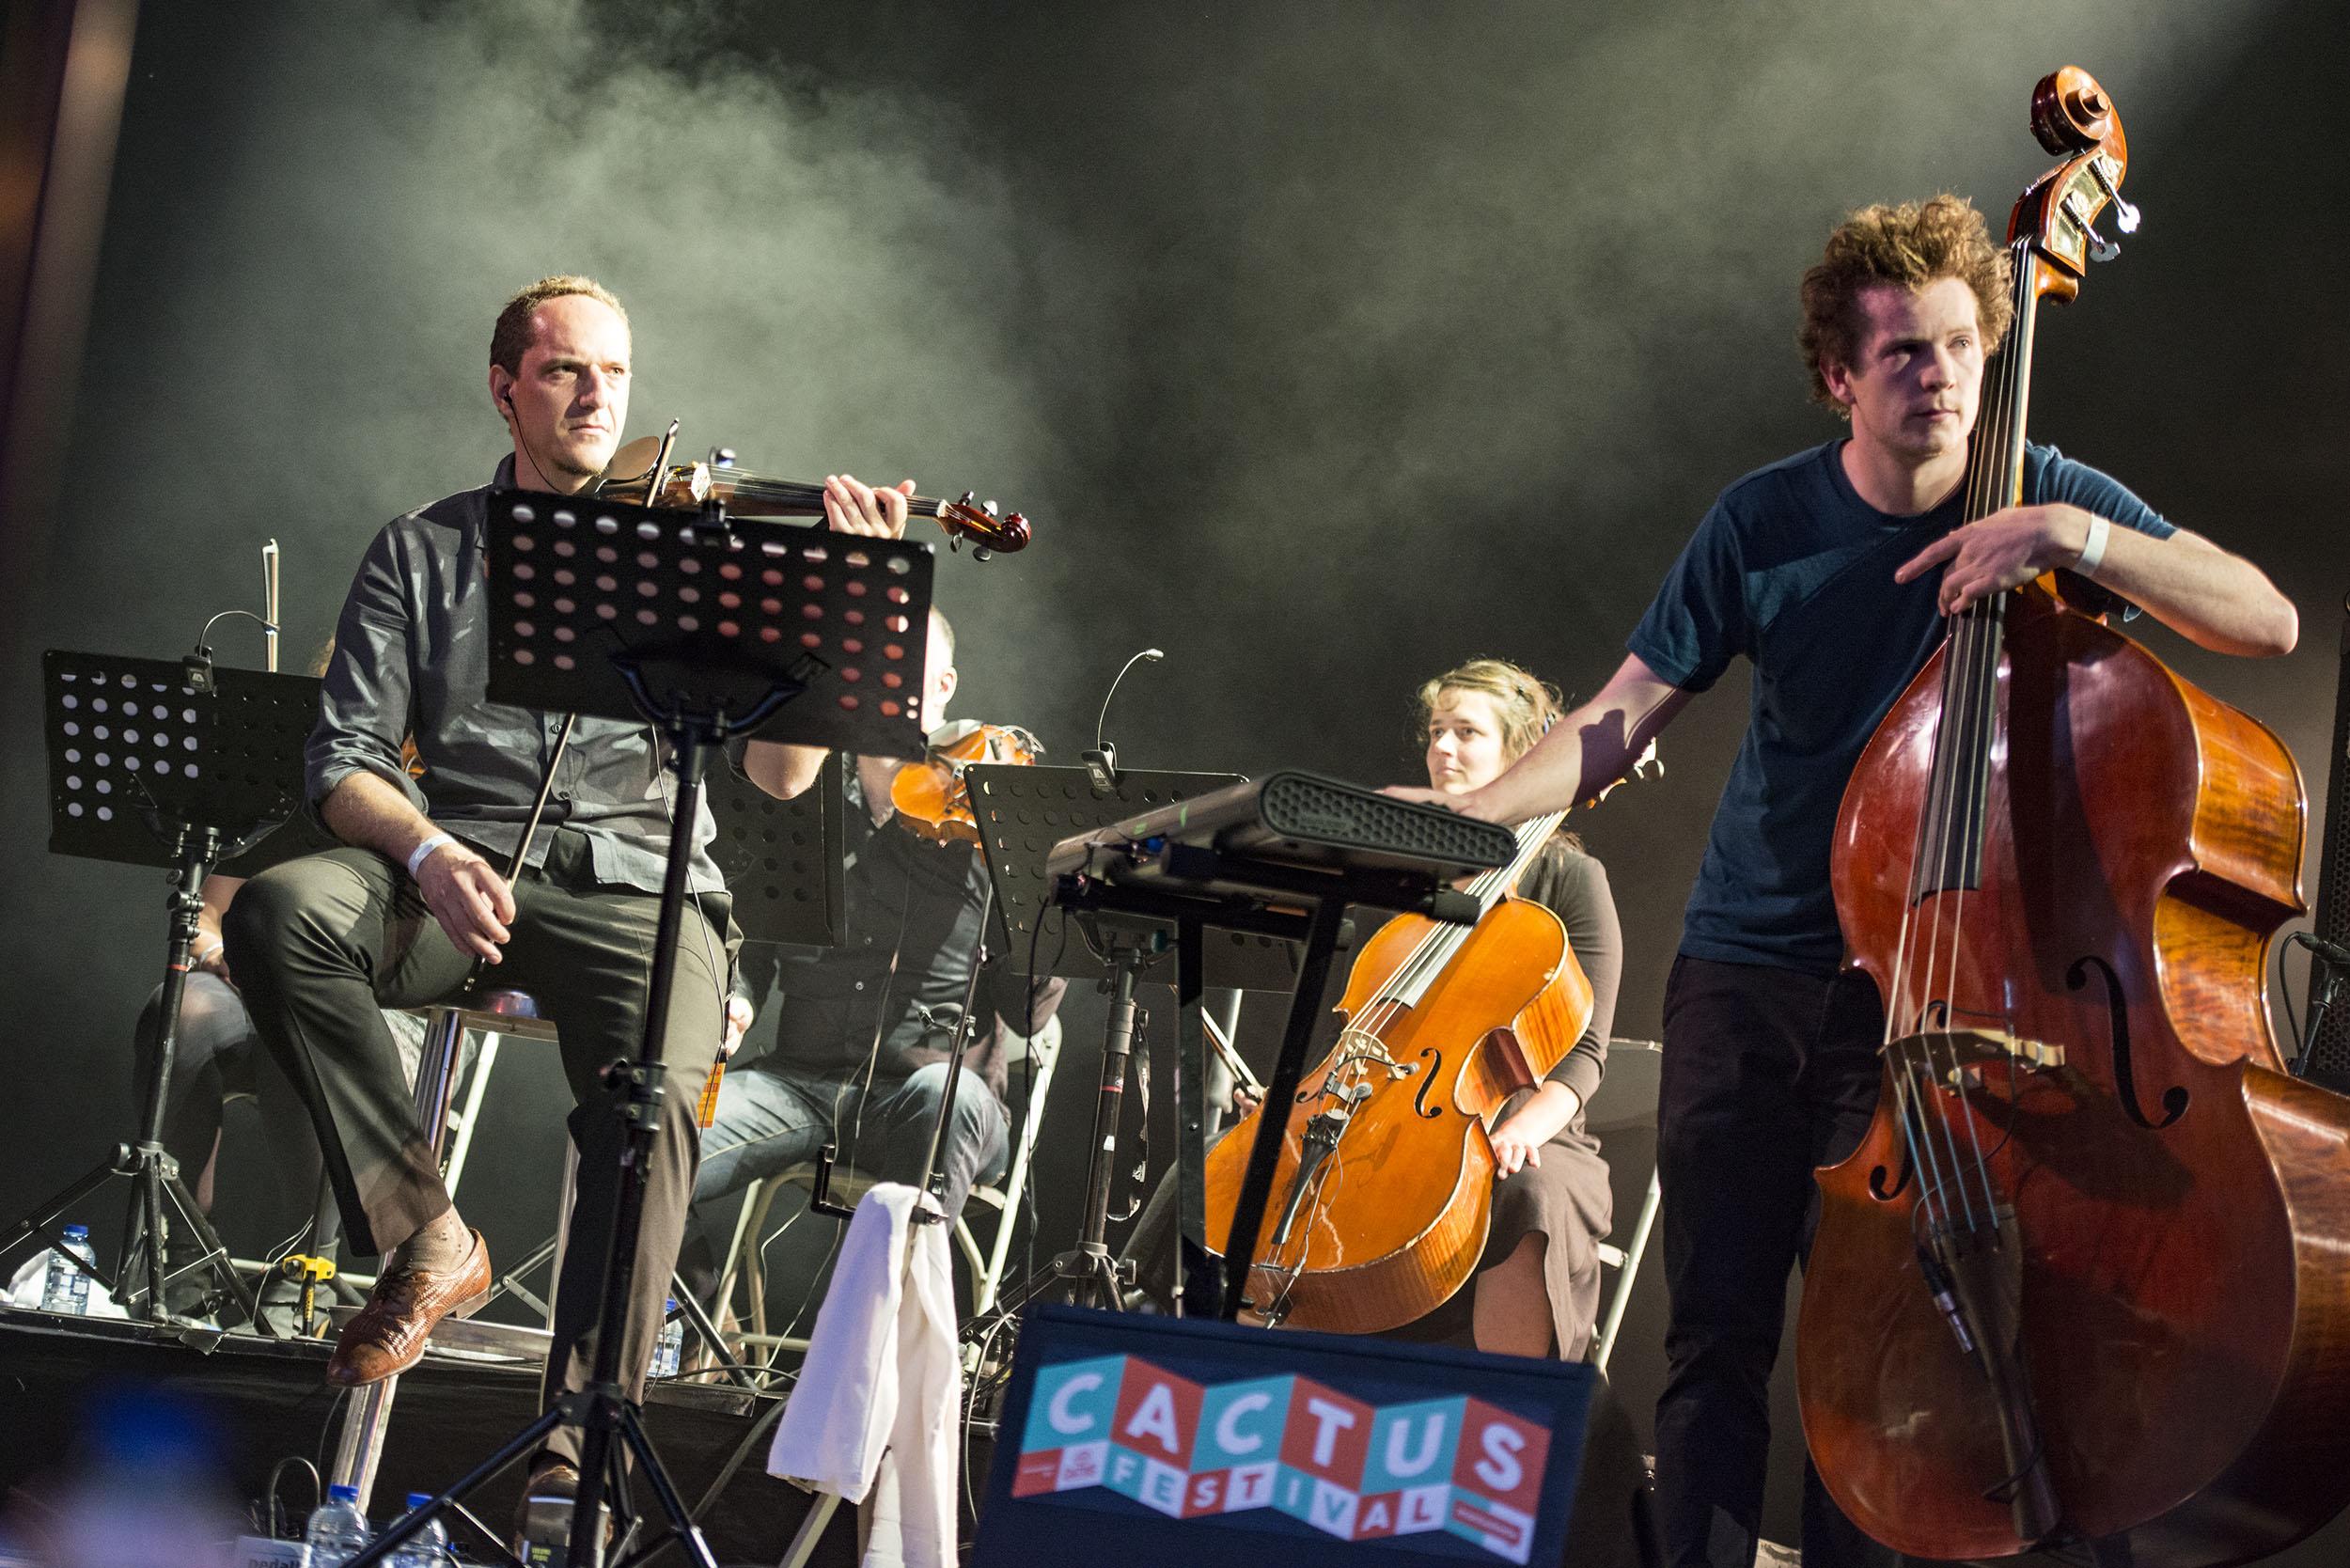 The Cinematic Orchestra @ Cactusfestival 2016 (© Nick De Baerdemaeker)